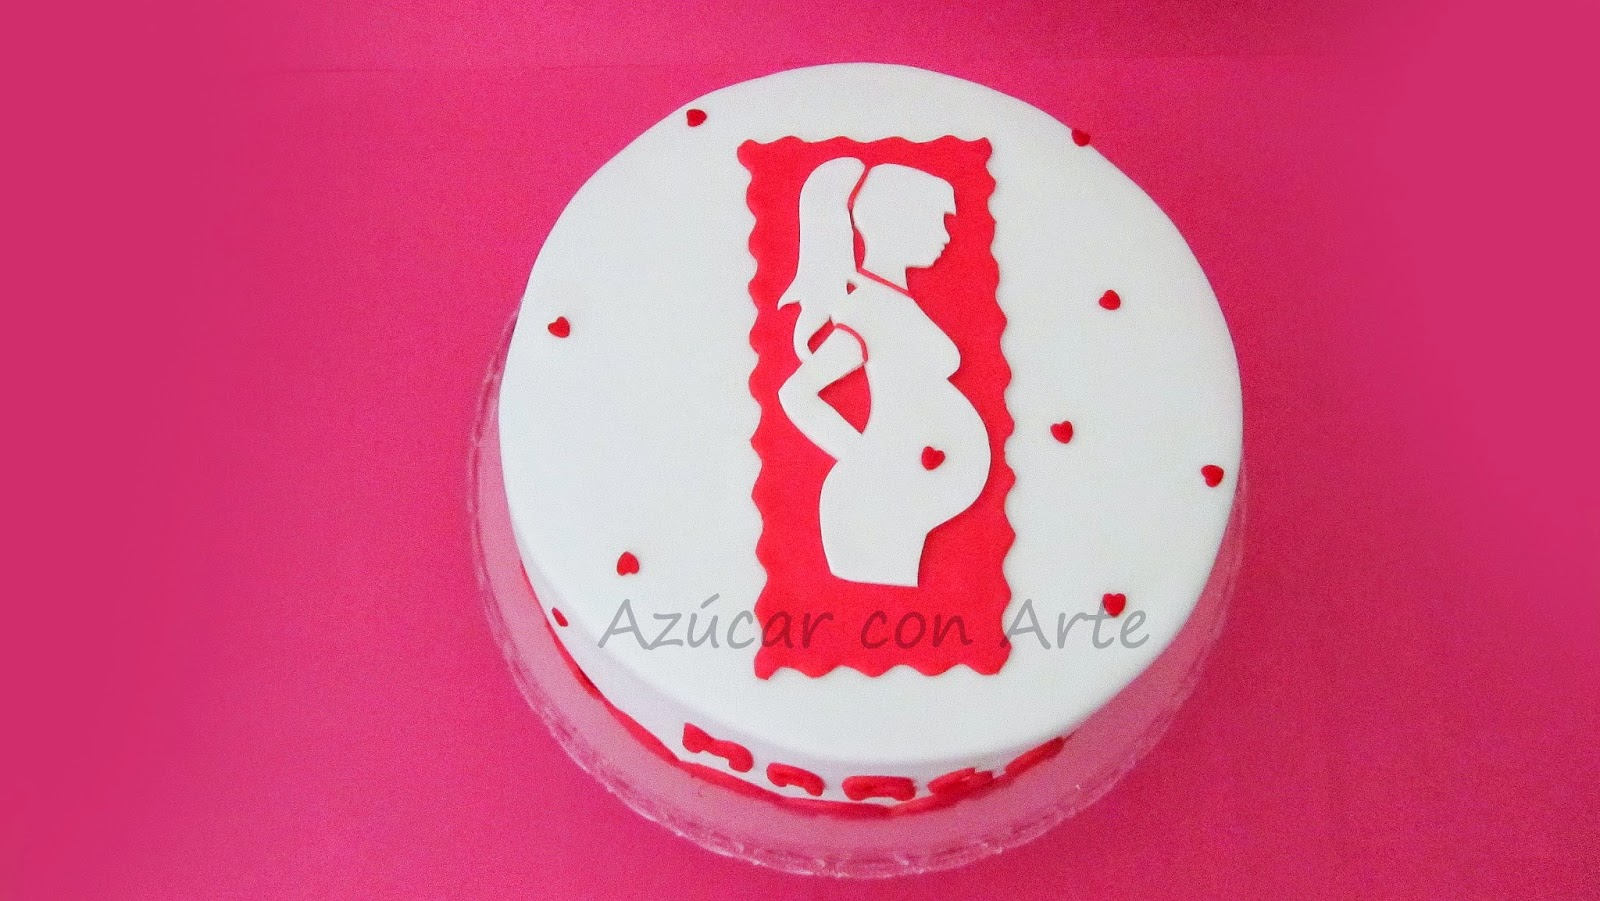 tarta embarazada, Pregnant woman cake, tarta sin gluten, gluten free cake  azucar con arte